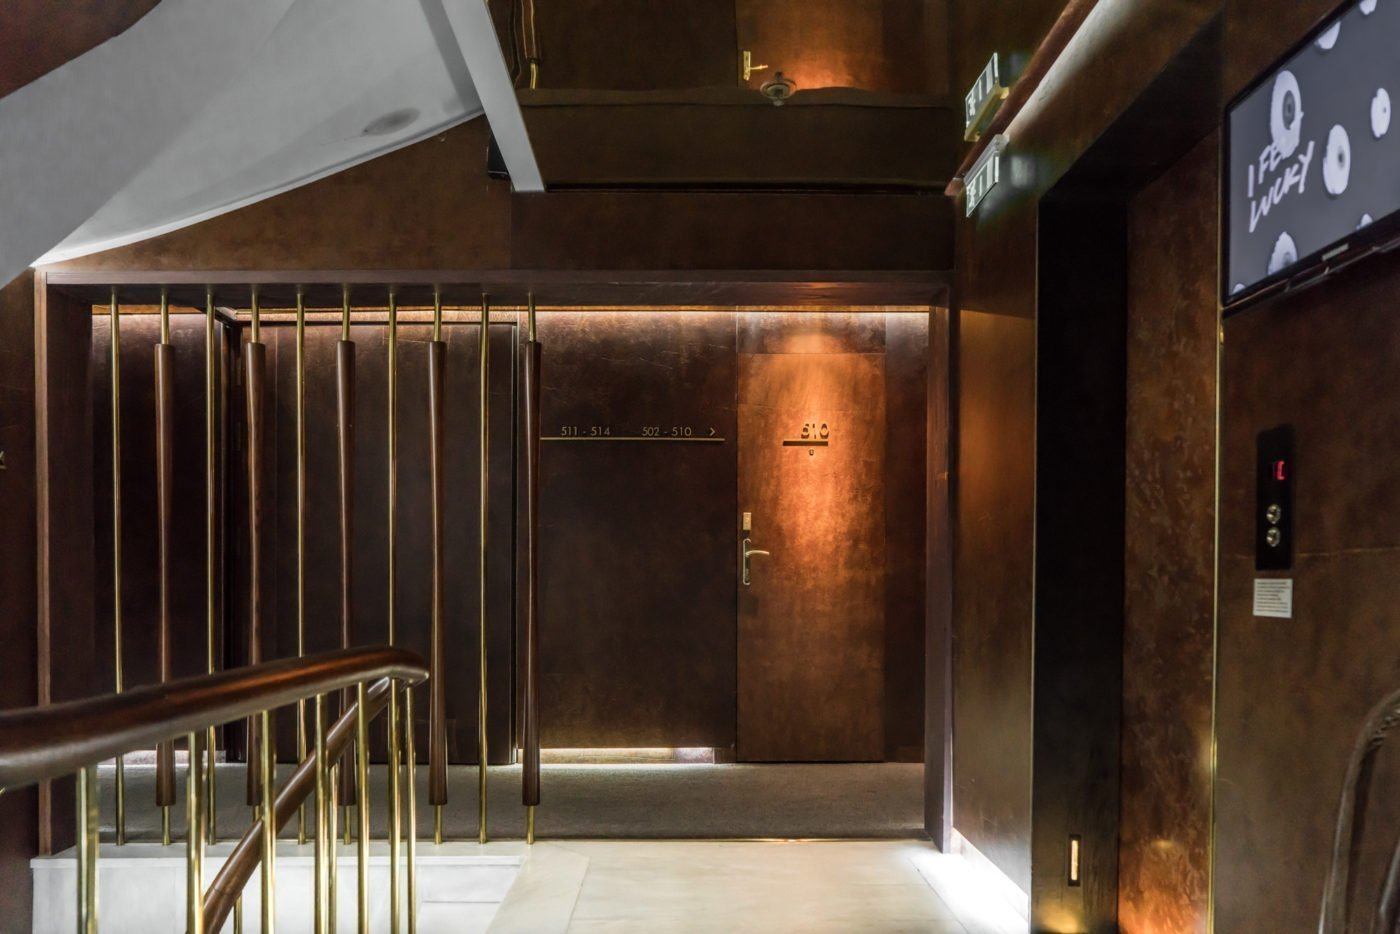 Hallway of NEW Hotel Athens